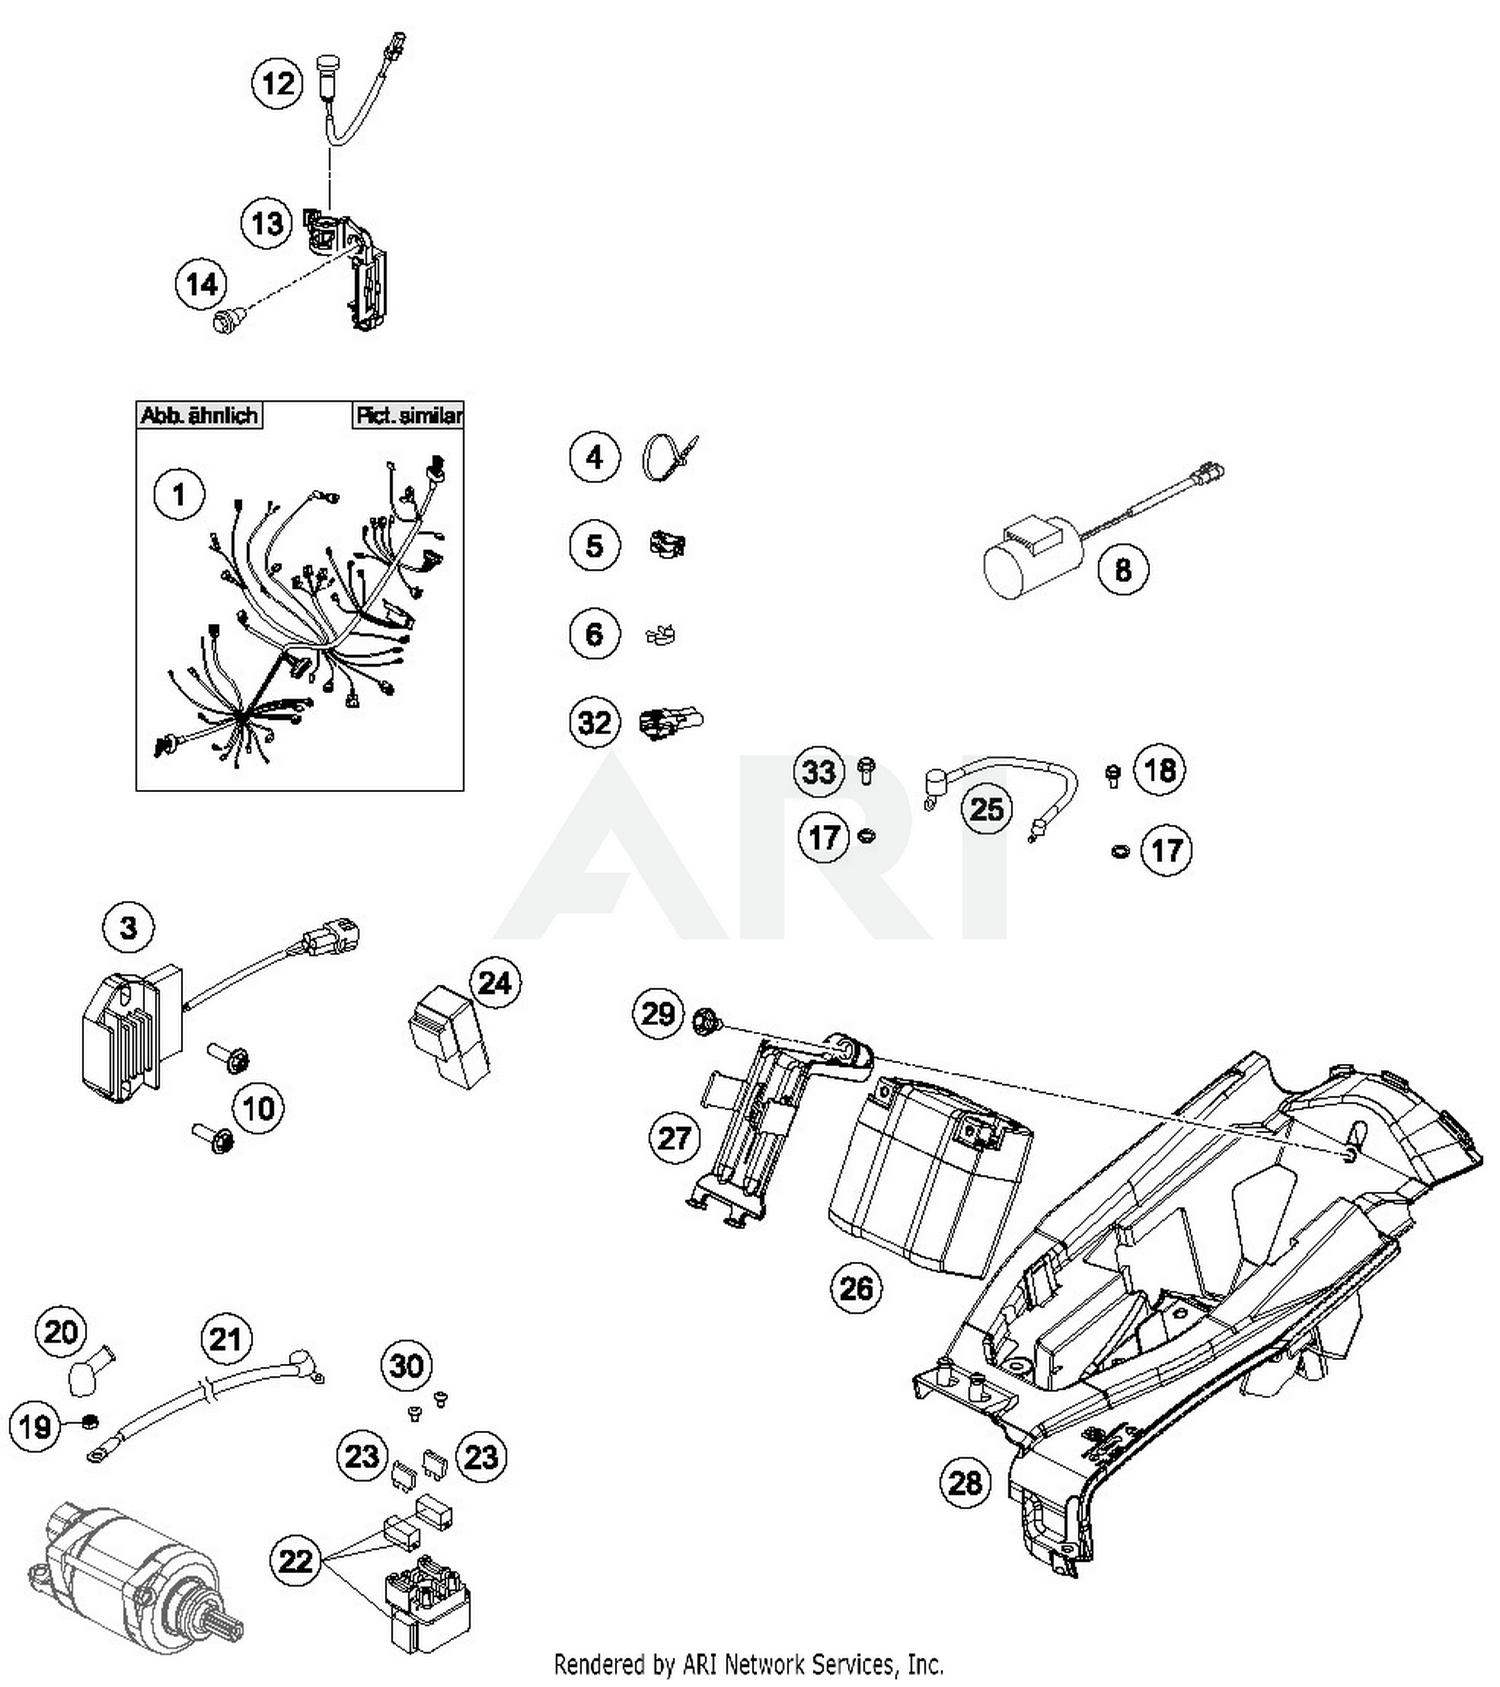 2017 Husqvarna FC 350 Wiring Harness Parts - Best OEM Wiring ... on